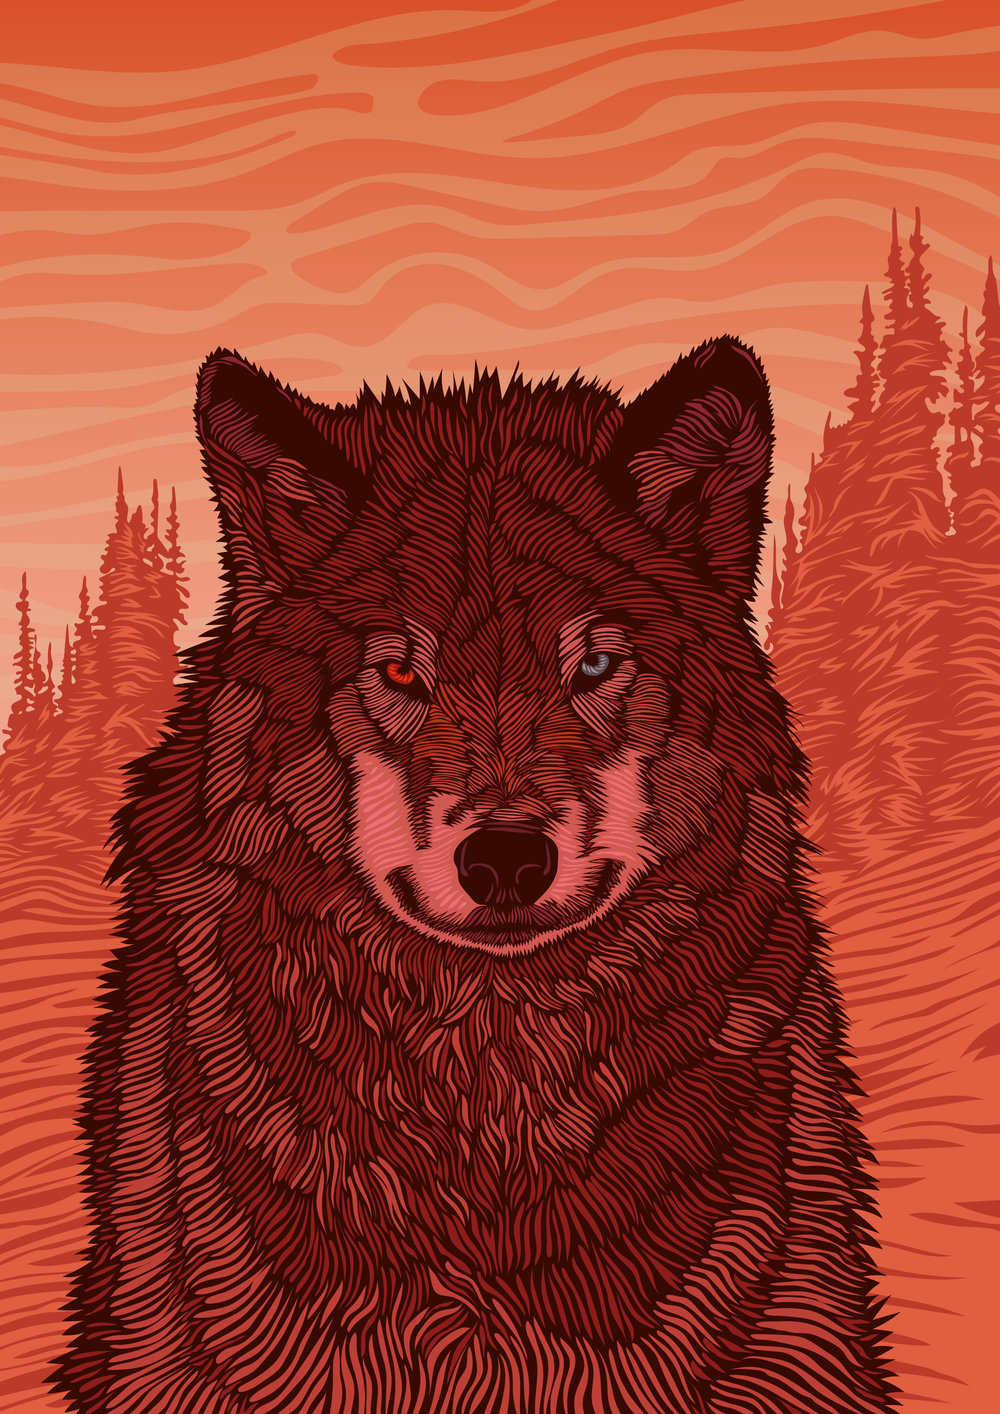 Loveblood - Jacob Light- Wild-Wolf-Illustration-reddish.jpg